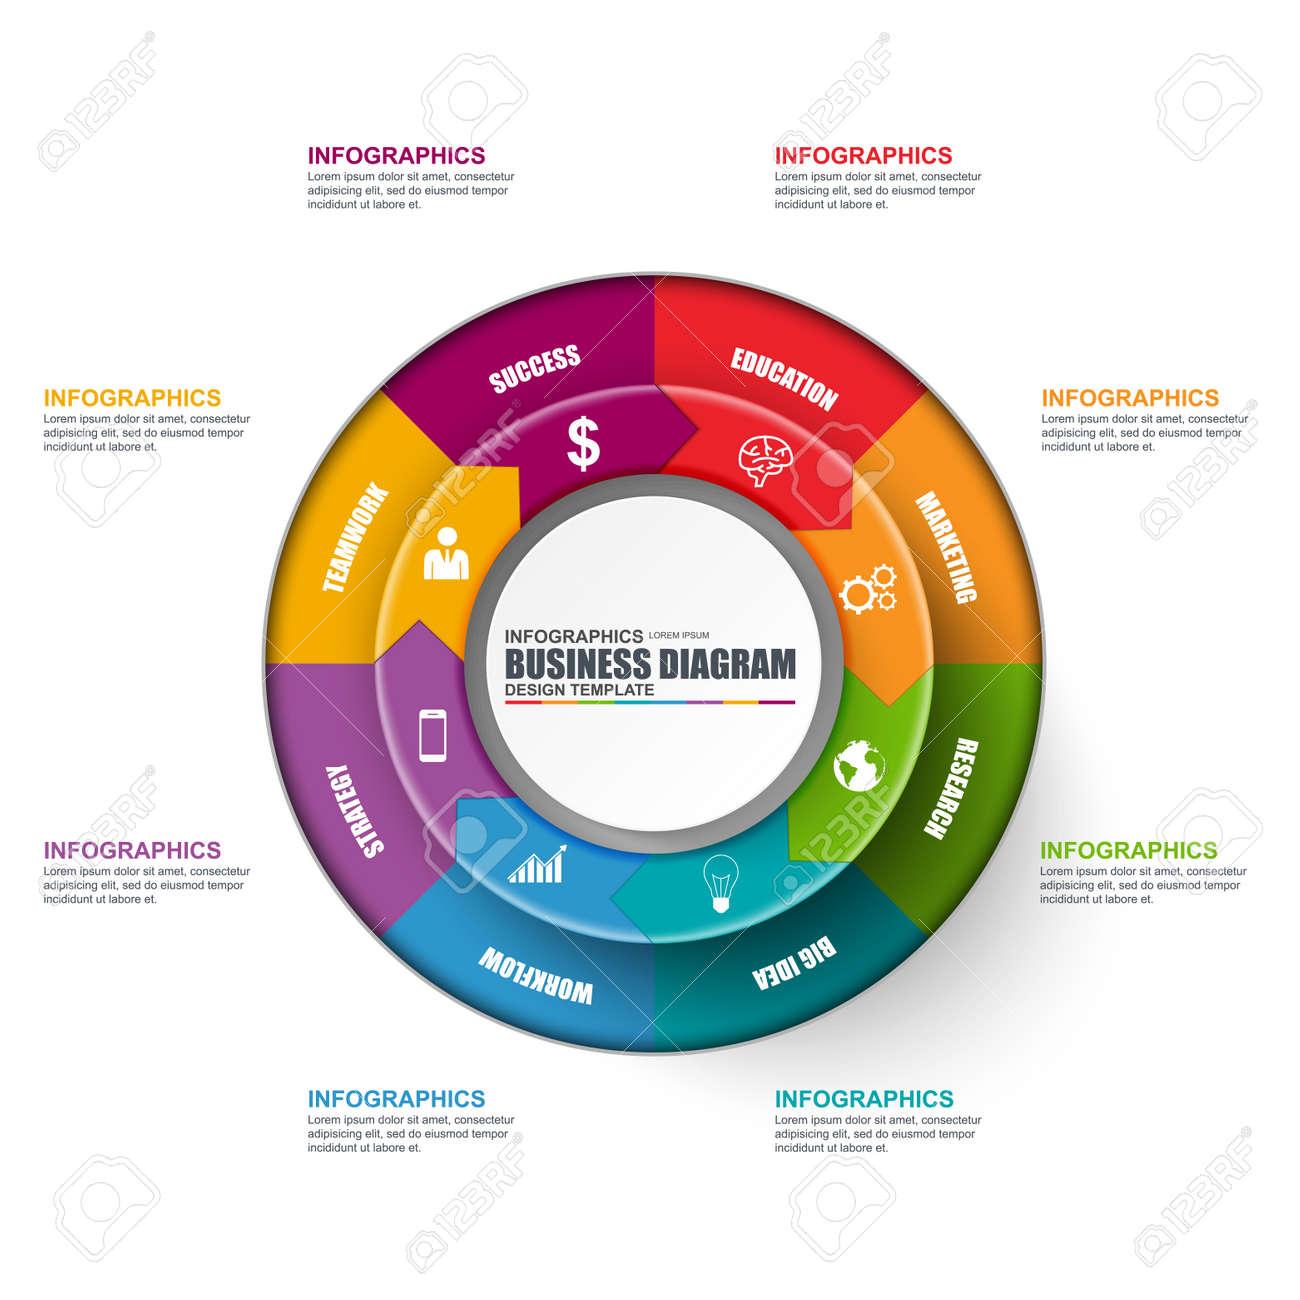 Infographic circular diagram vector design template can be used infographic circular diagram vector design template can be used for workflow cycle layout wajeb Gallery